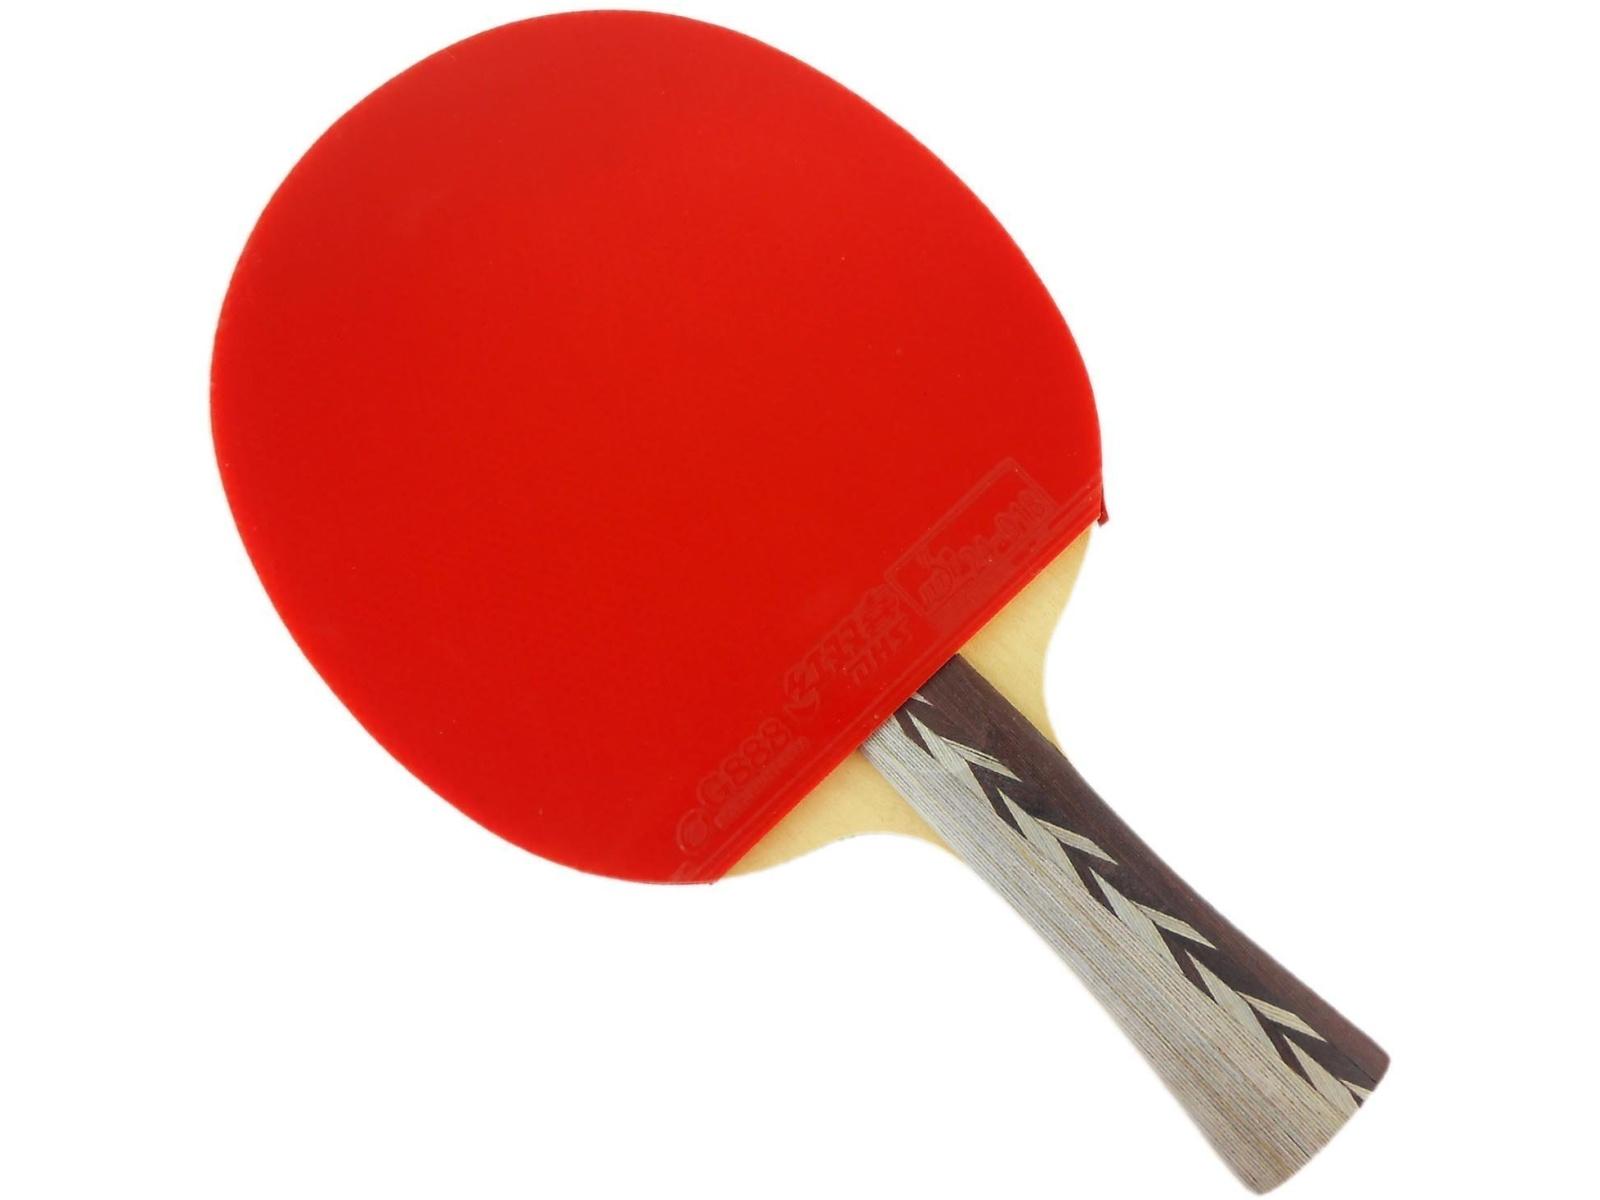 Pálka na stolní tenis DOUBLE HAPPINES 4002